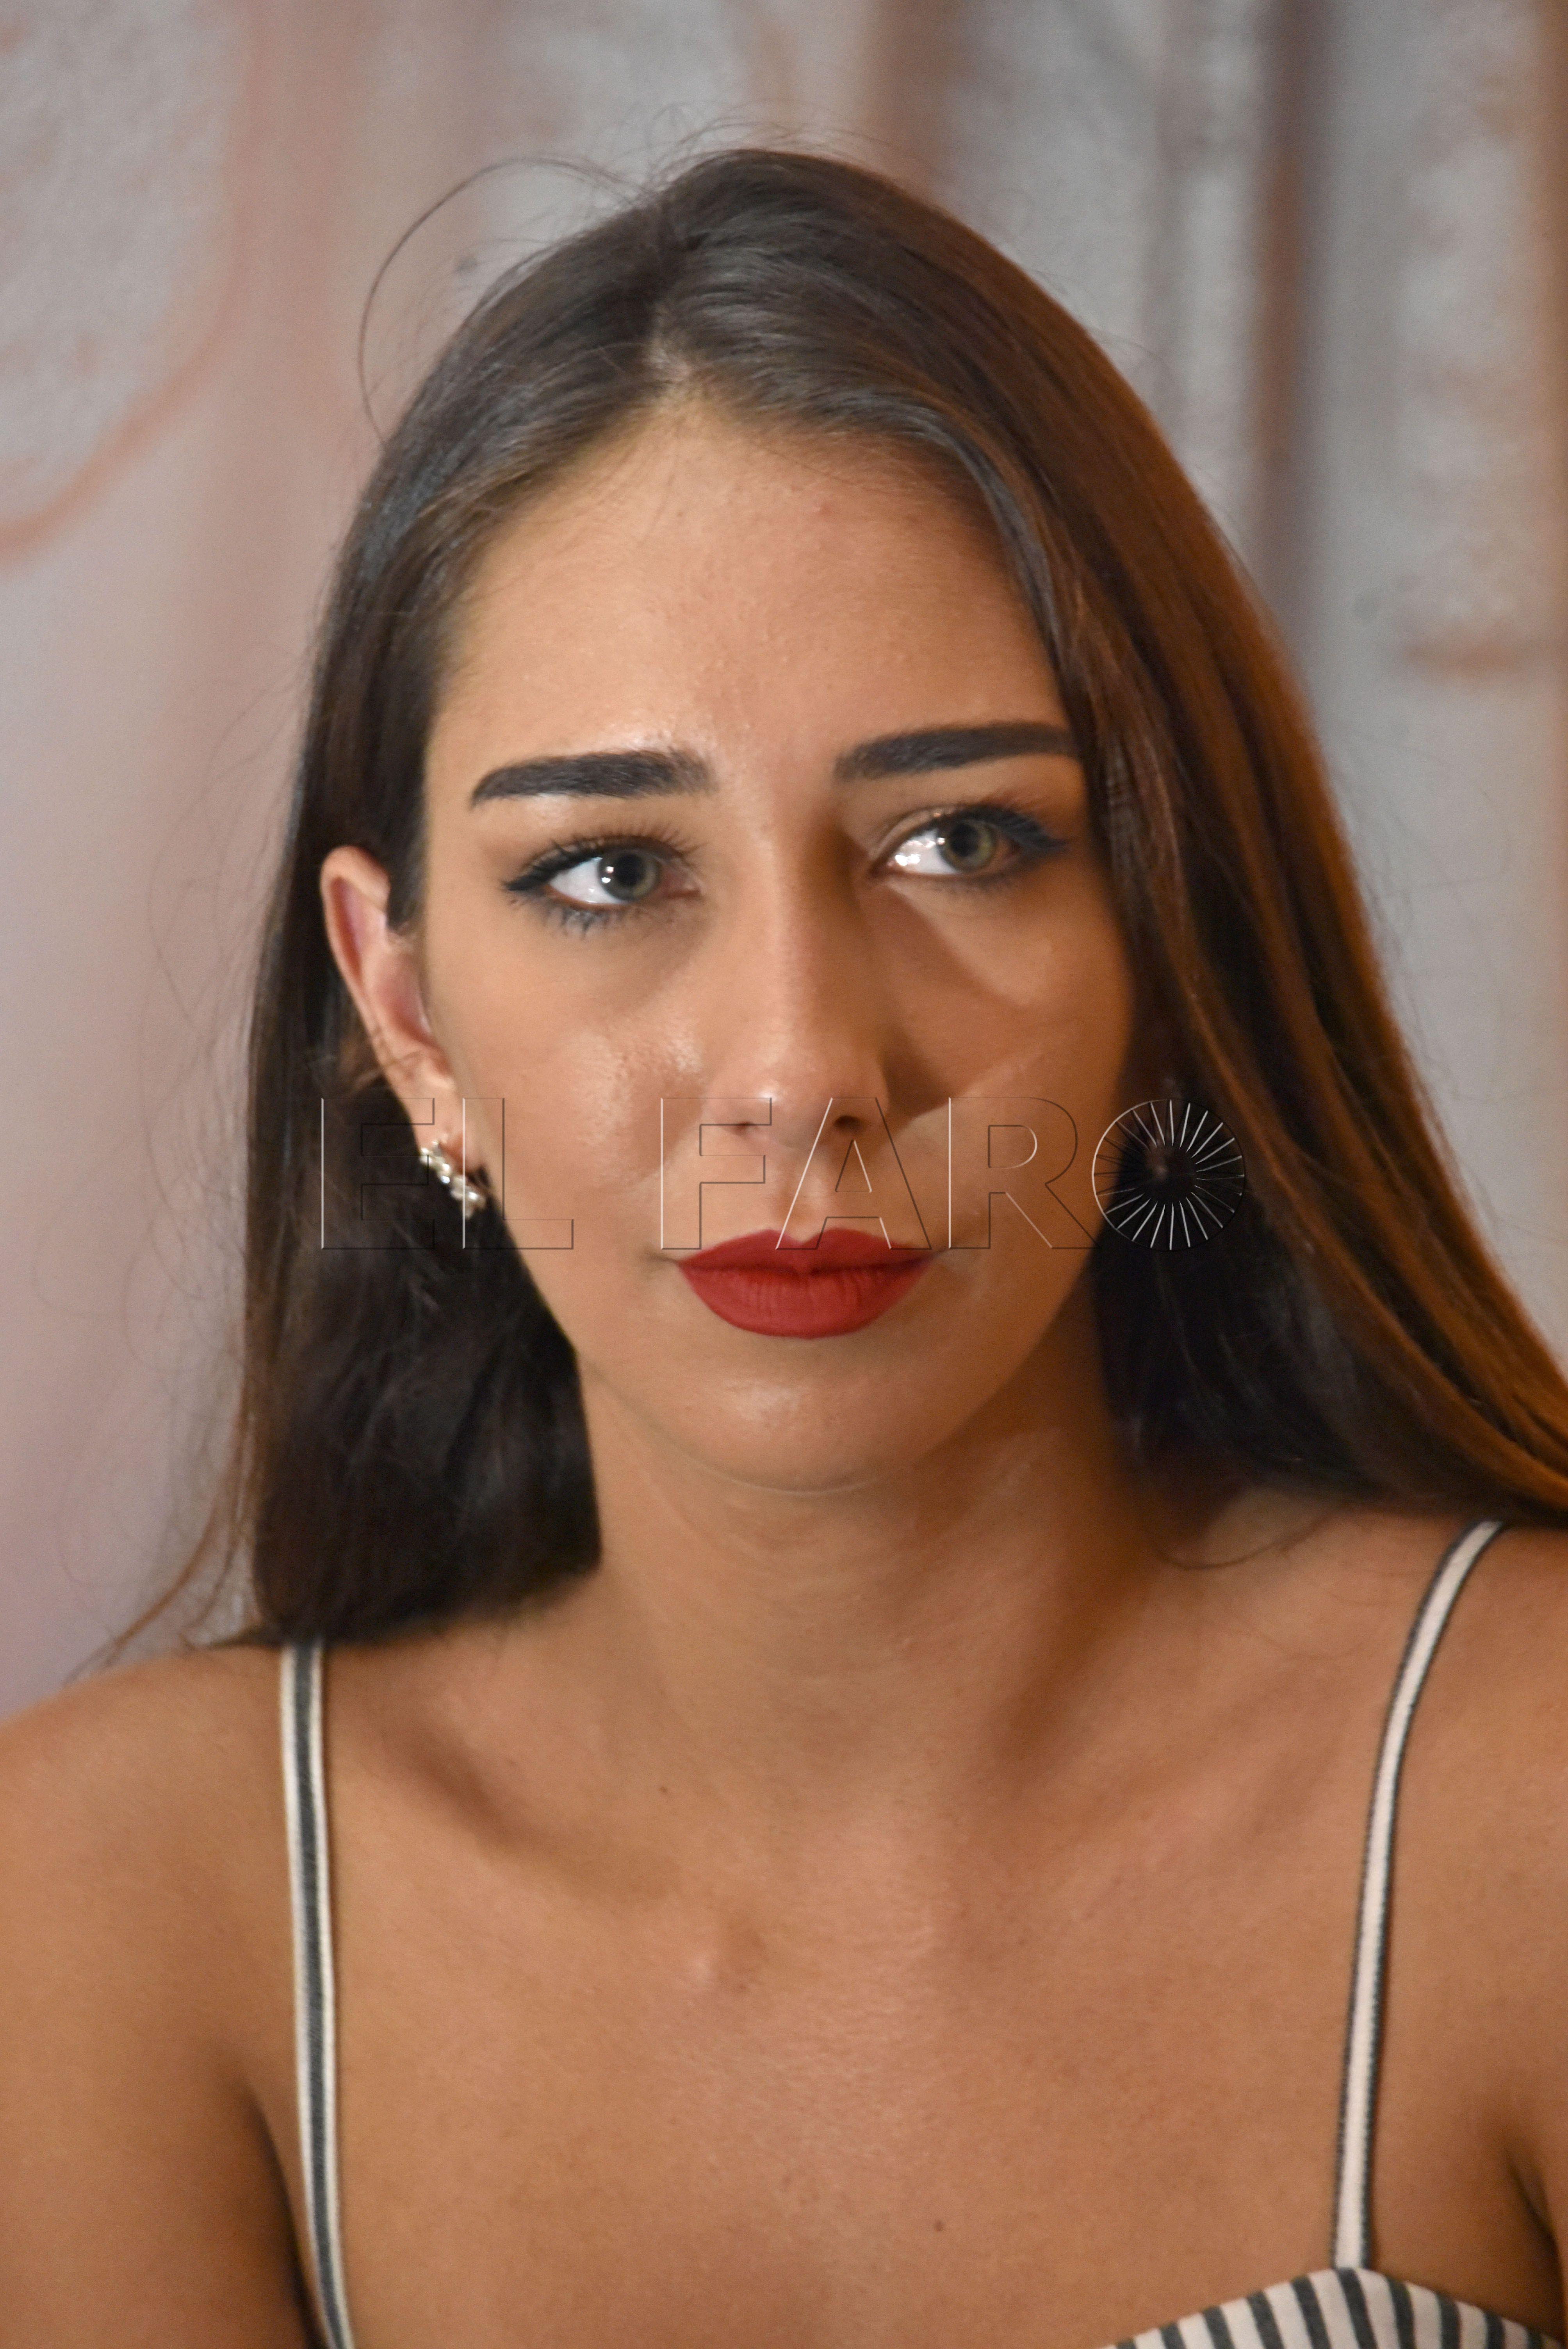 Feminista, futura guardia civil y modelo: Sara Martínez, la candidata ceutí a Miss Mundo 2019 1sLXnL